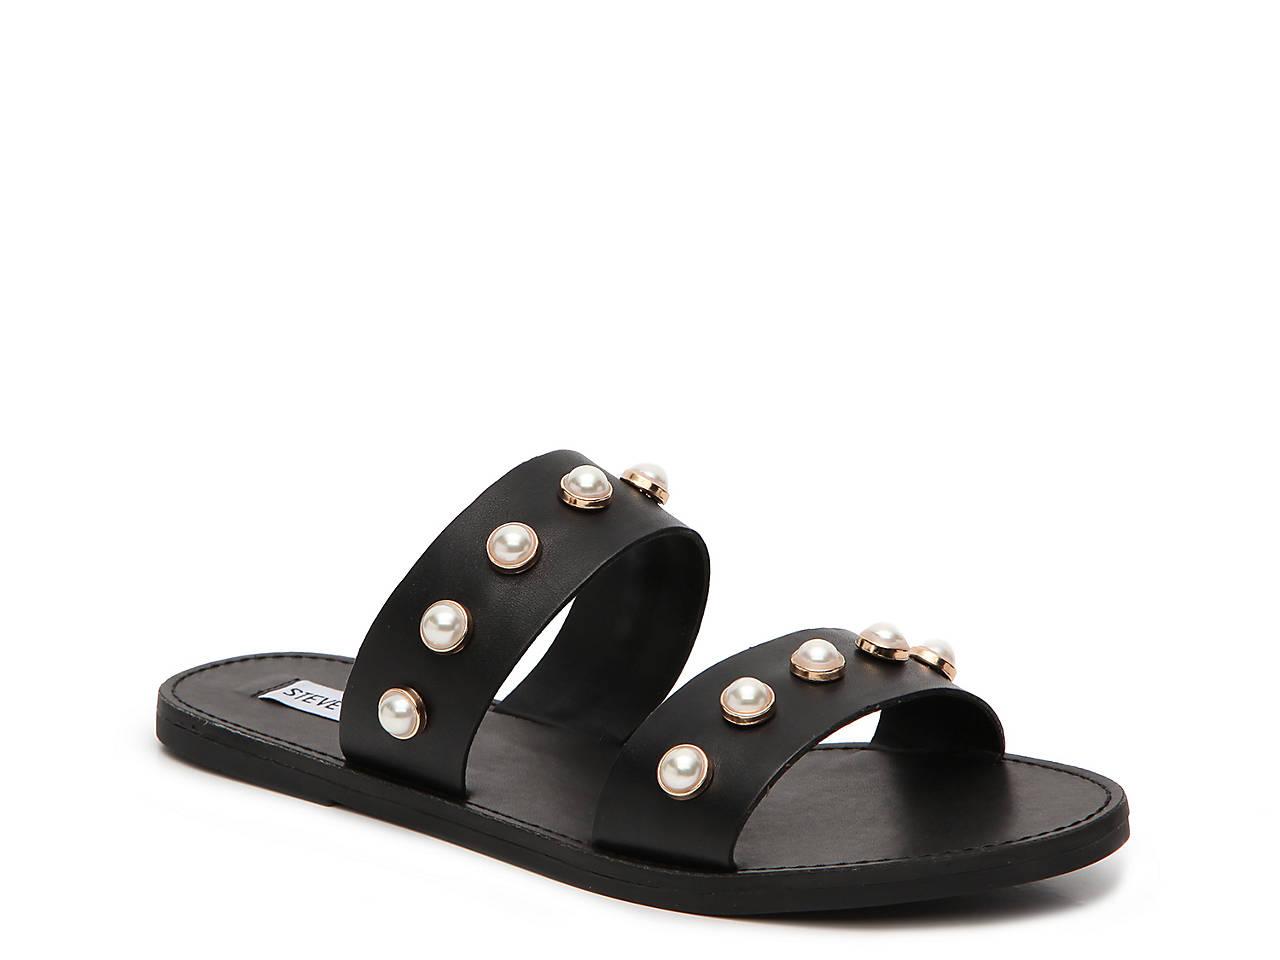 dcad44ccd4ce0 Steve Madden Jole Flat Sandal Women s Shoes